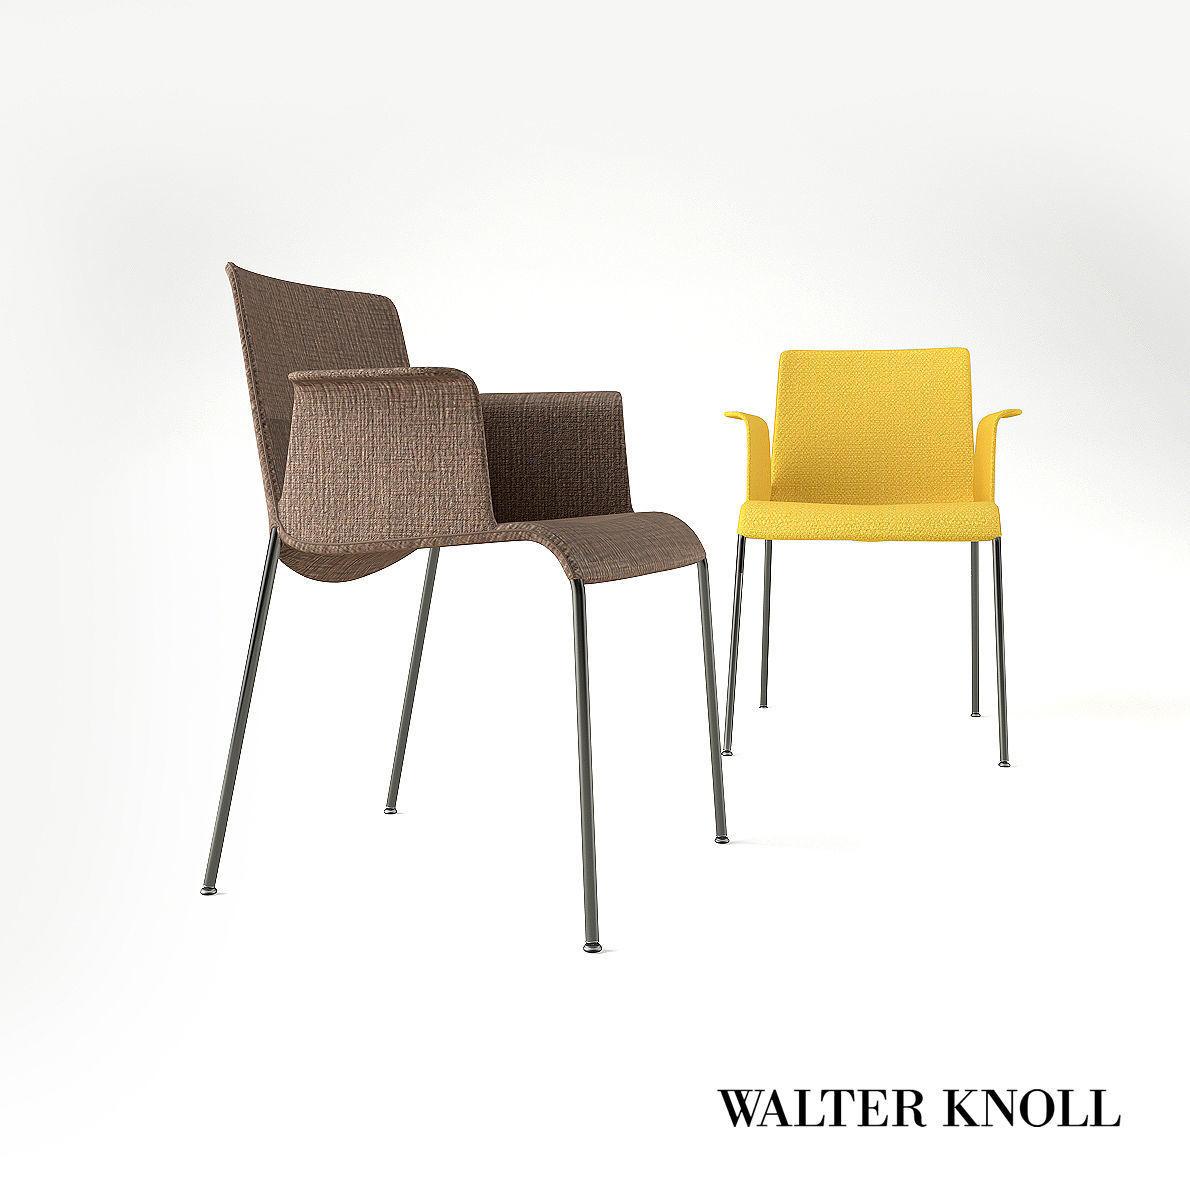 Claudio Bellini Design.Armchair Liz From Walter Knoll Design By Claudio Bellini 3d Model